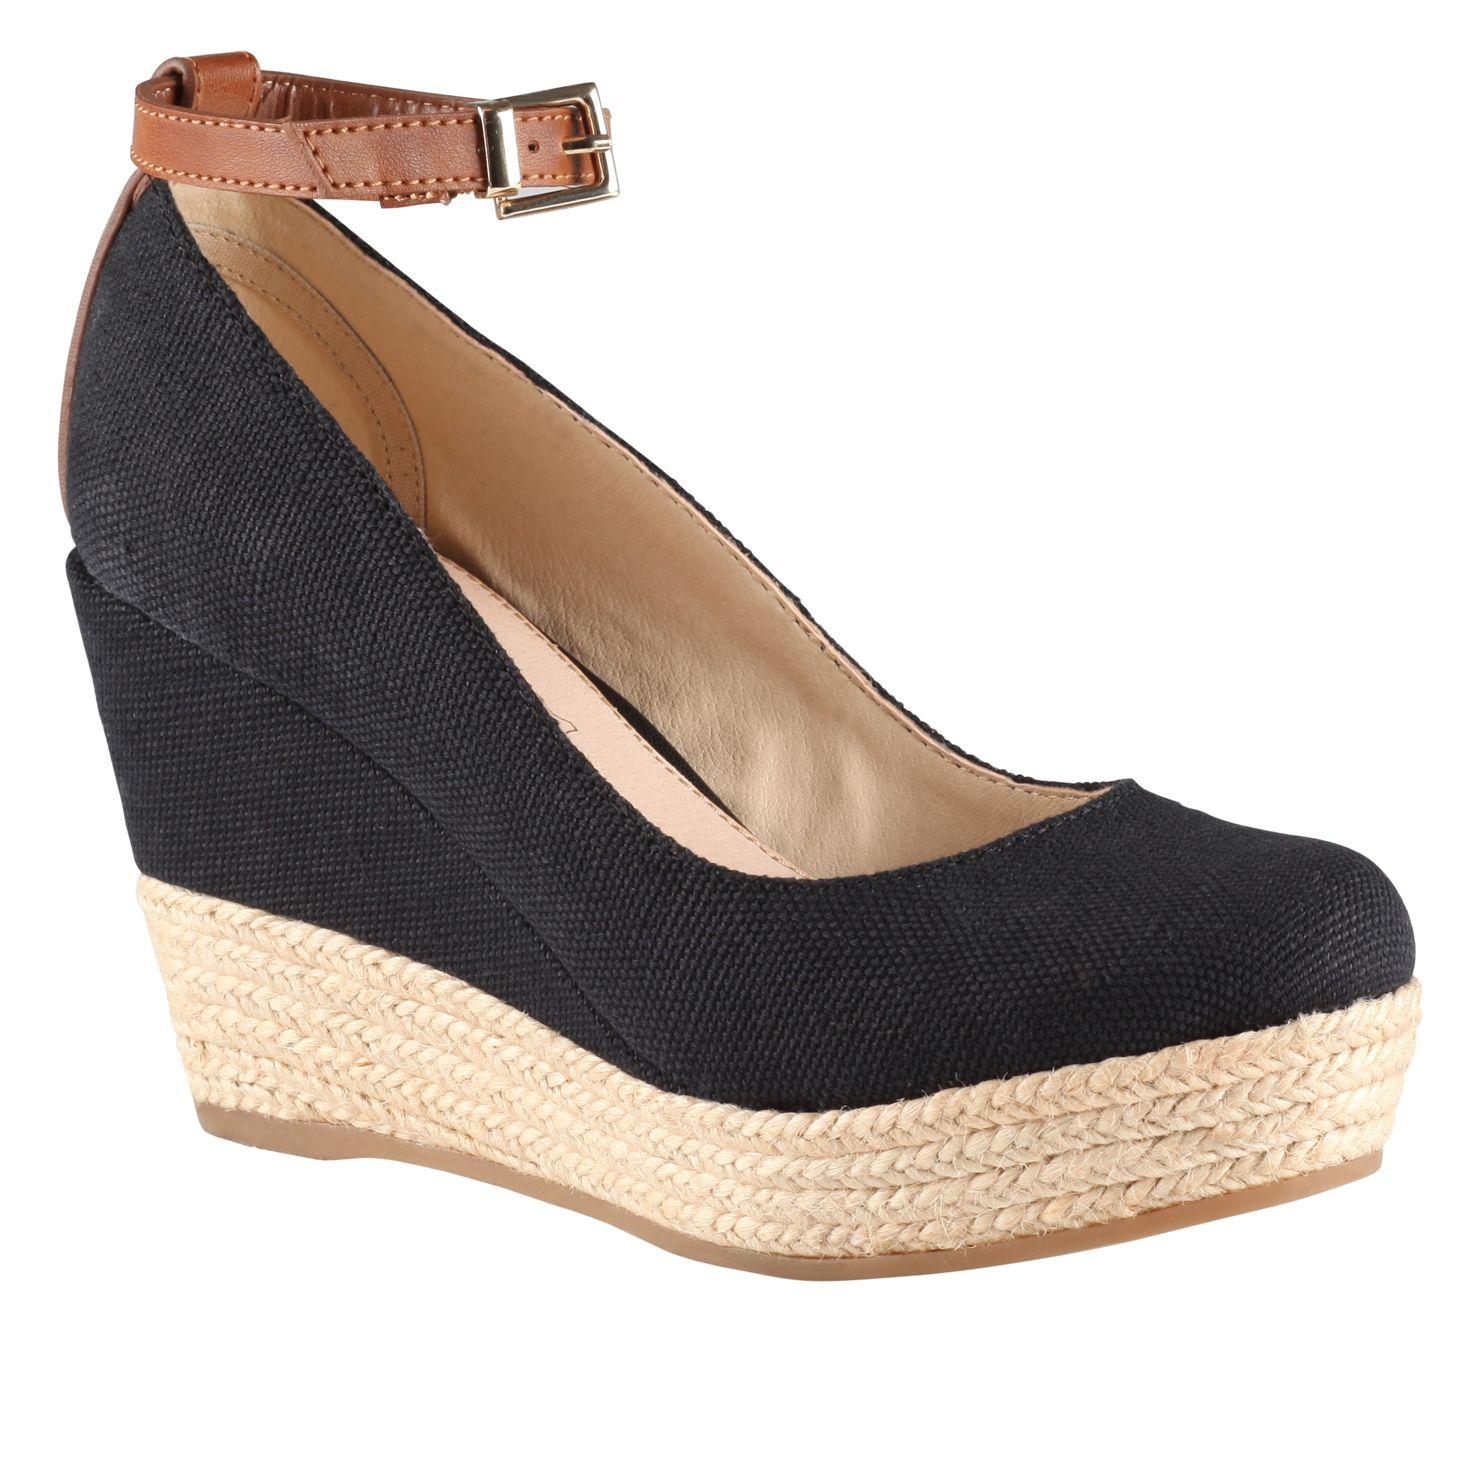 aldo grenama almond toe wedge espadrille court shoes in